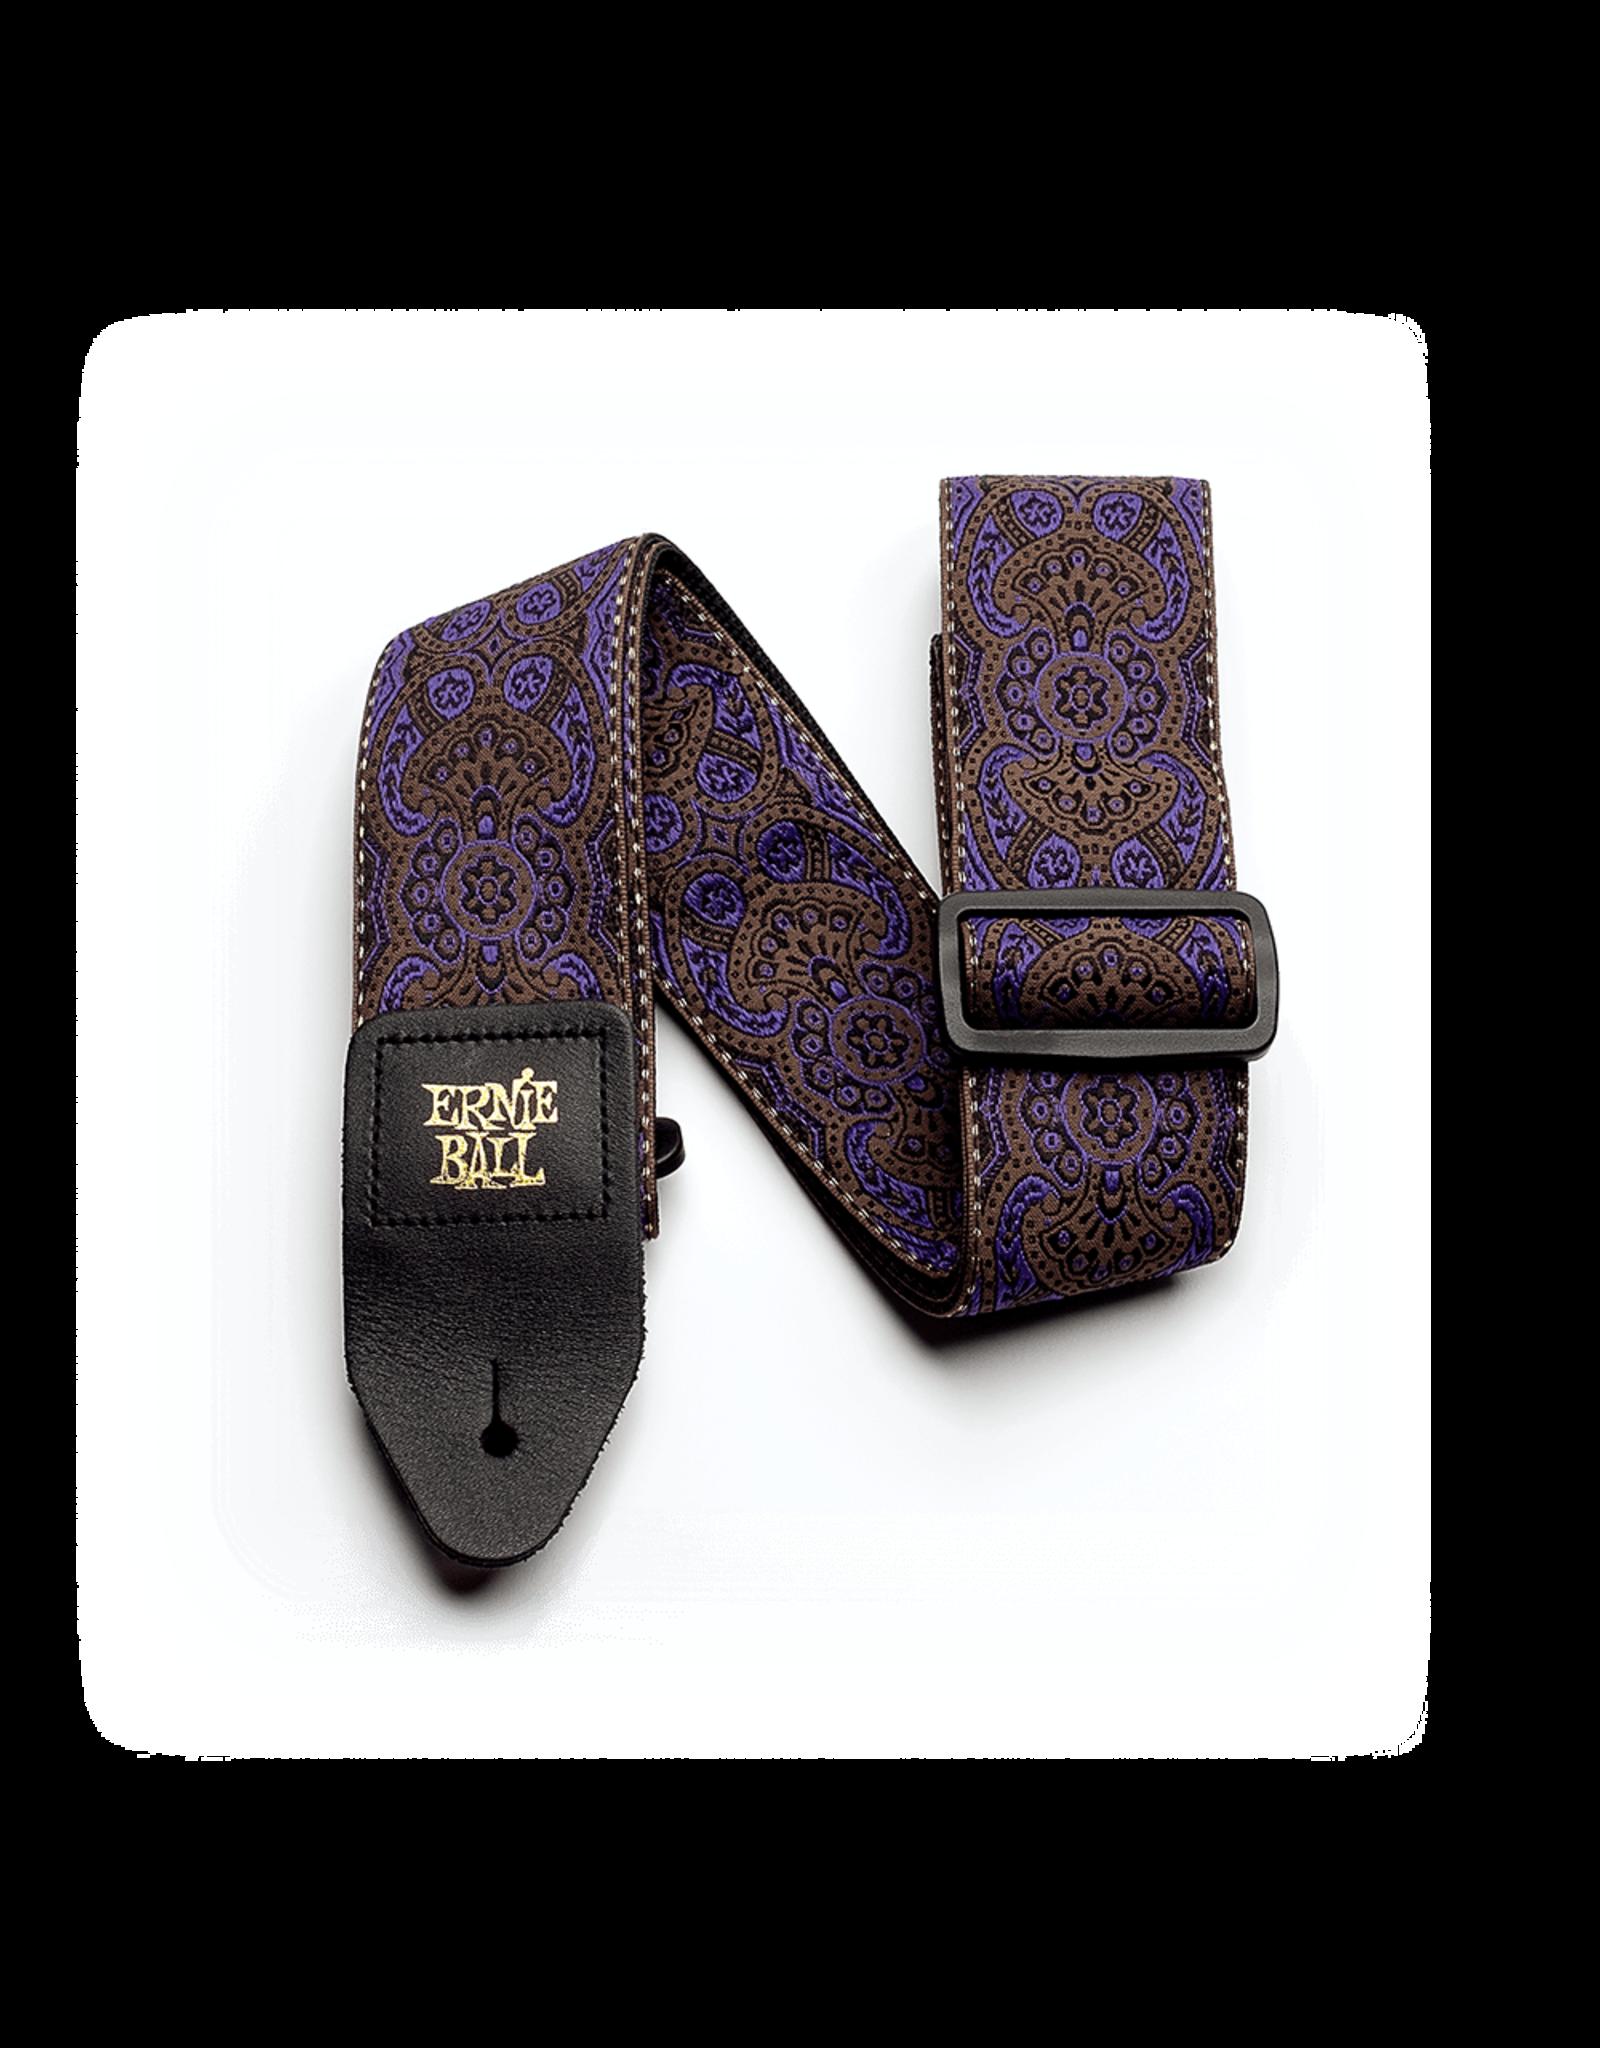 Ernie Ball Ernie Ball 4164 Purple Paisley Jacquard Strap